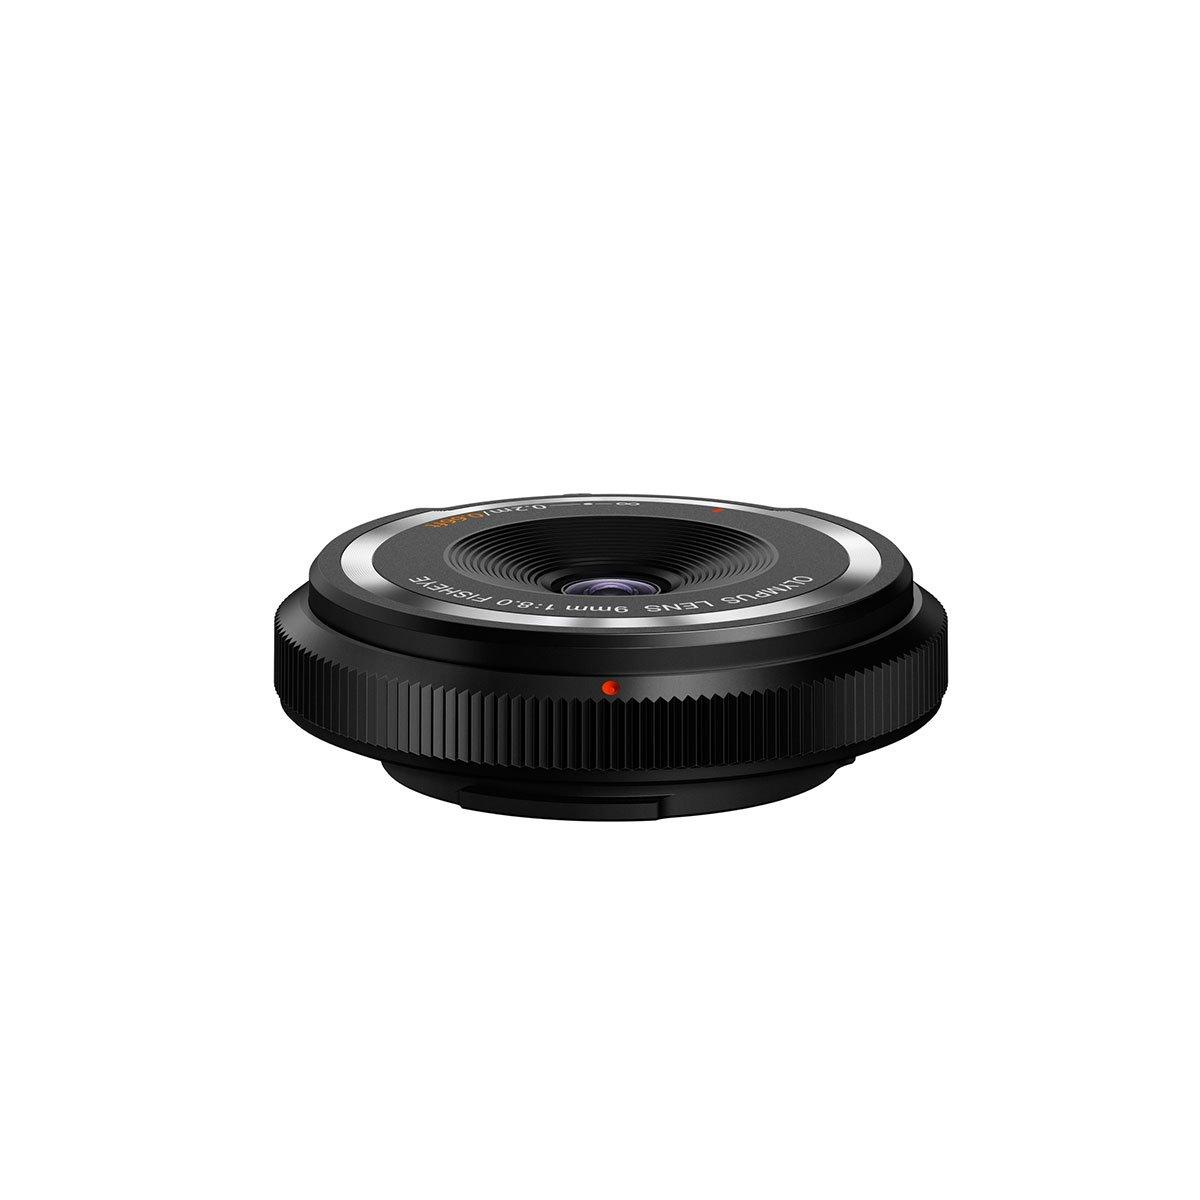 Olympus Body cap lens 9mm F8.0 fisheye musta